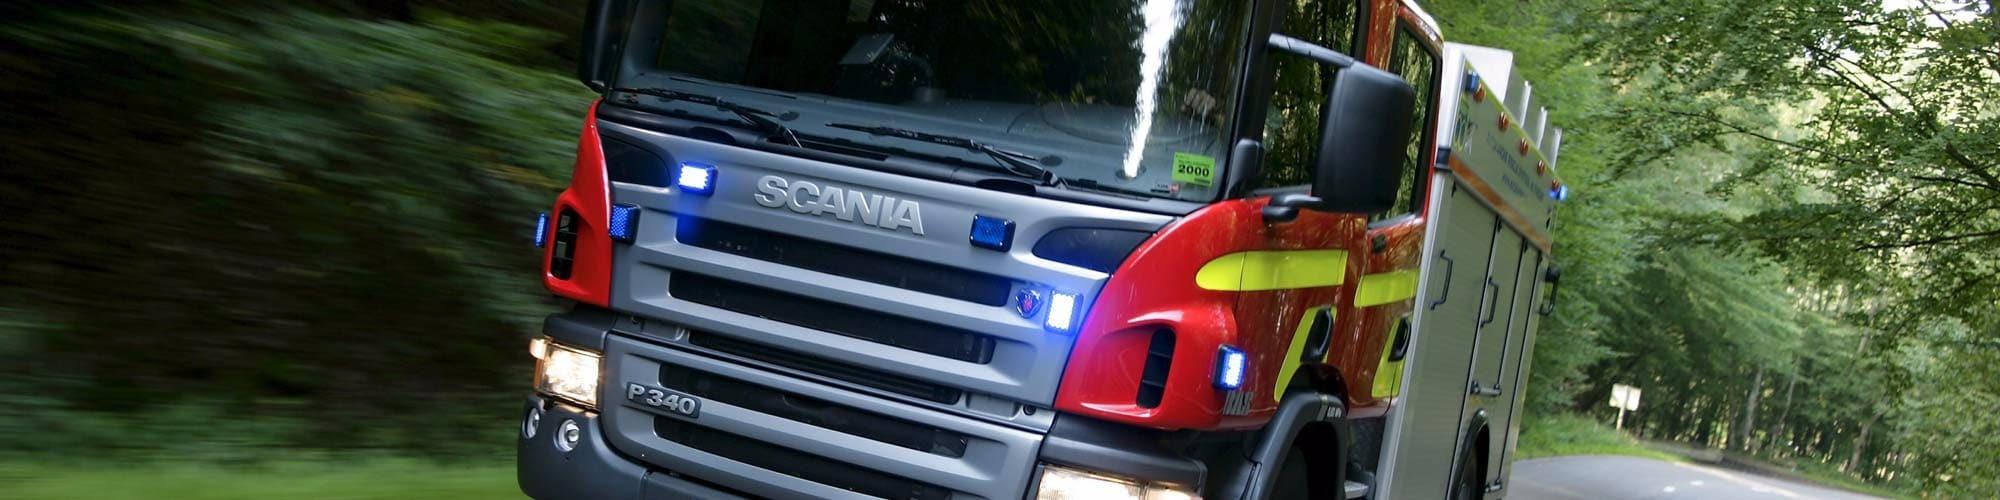 home-scania-firetruck